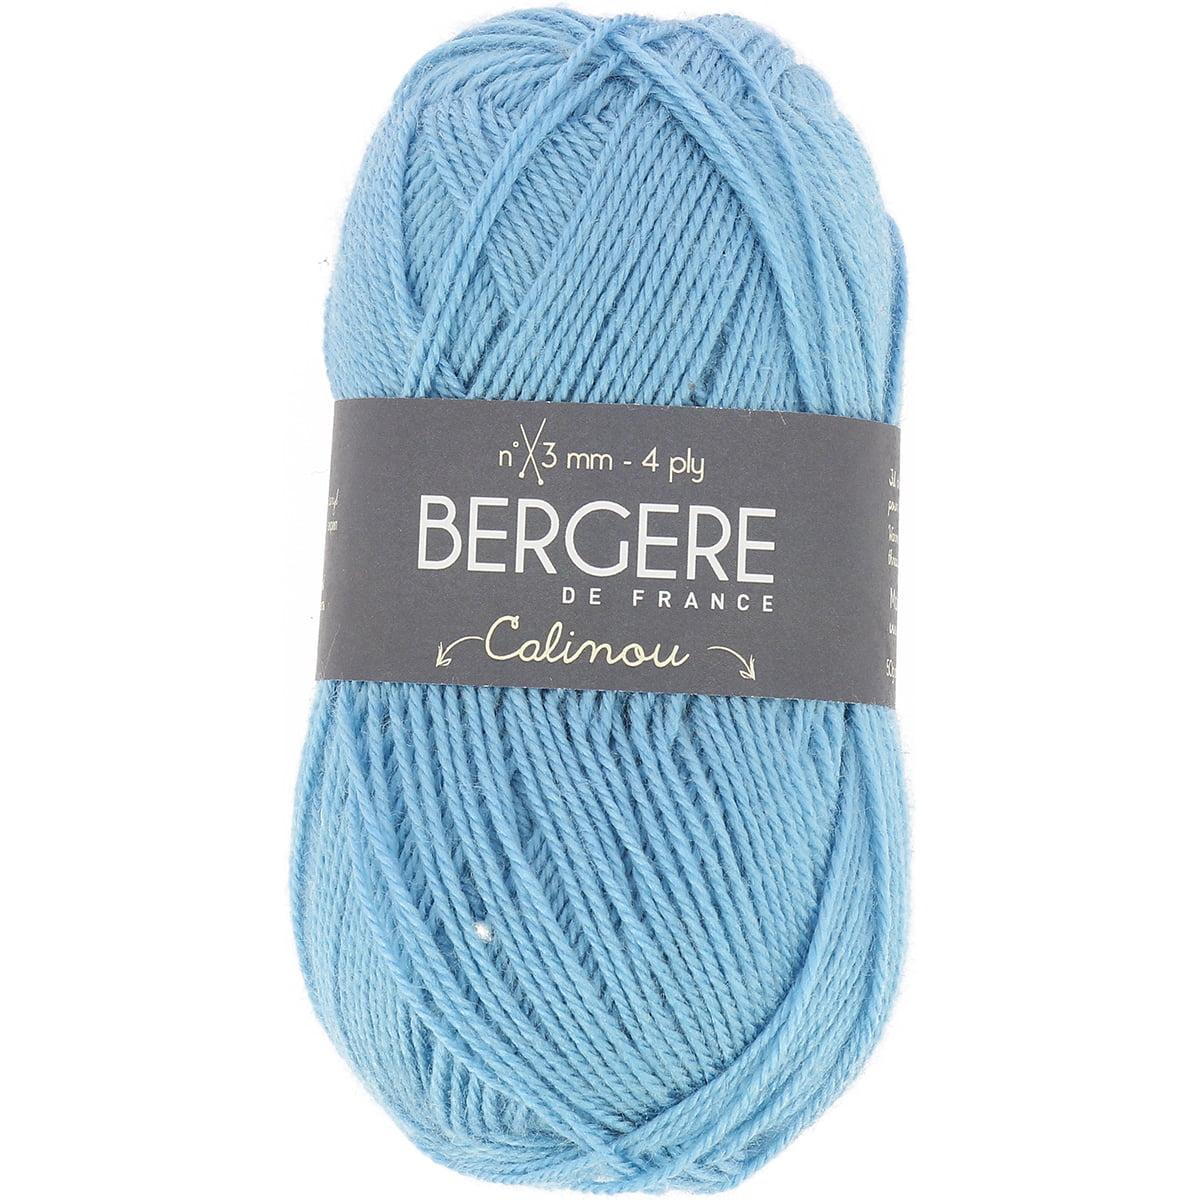 Bergere De France Calinou Yarn-Bleu Clair